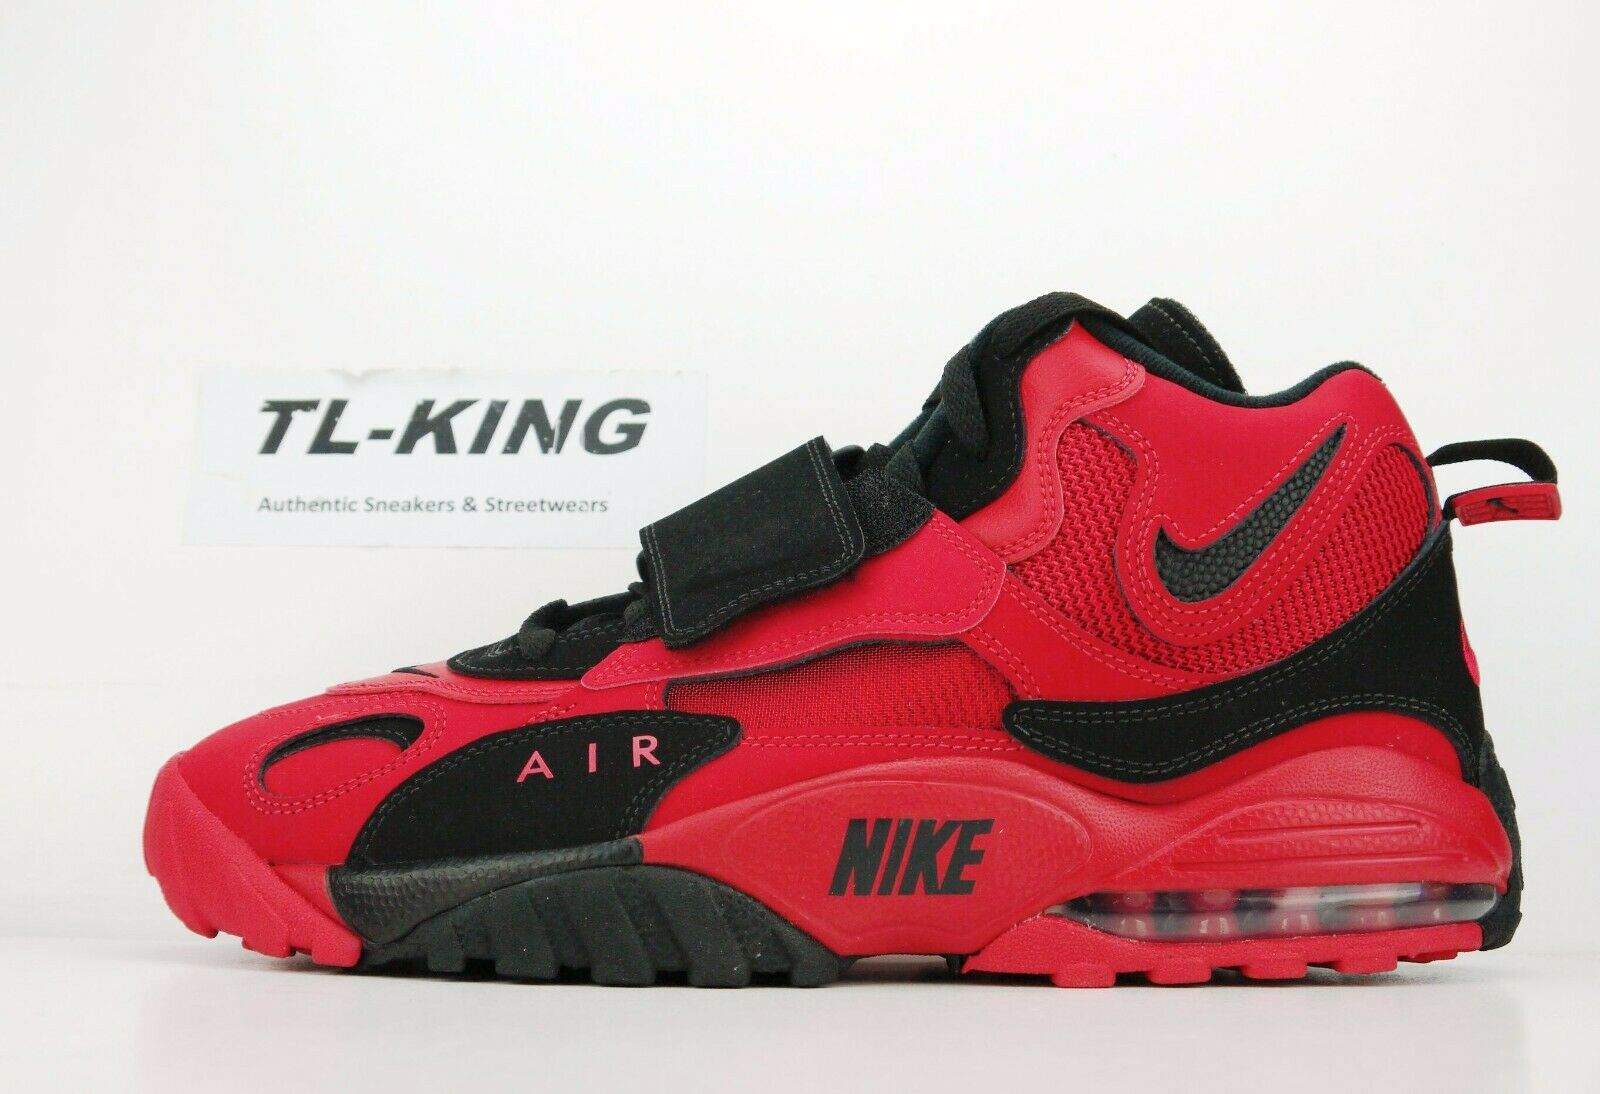 Nike Air Max Speed Turf Deion Sanders 49ers University Red Black AV7895 600 BN